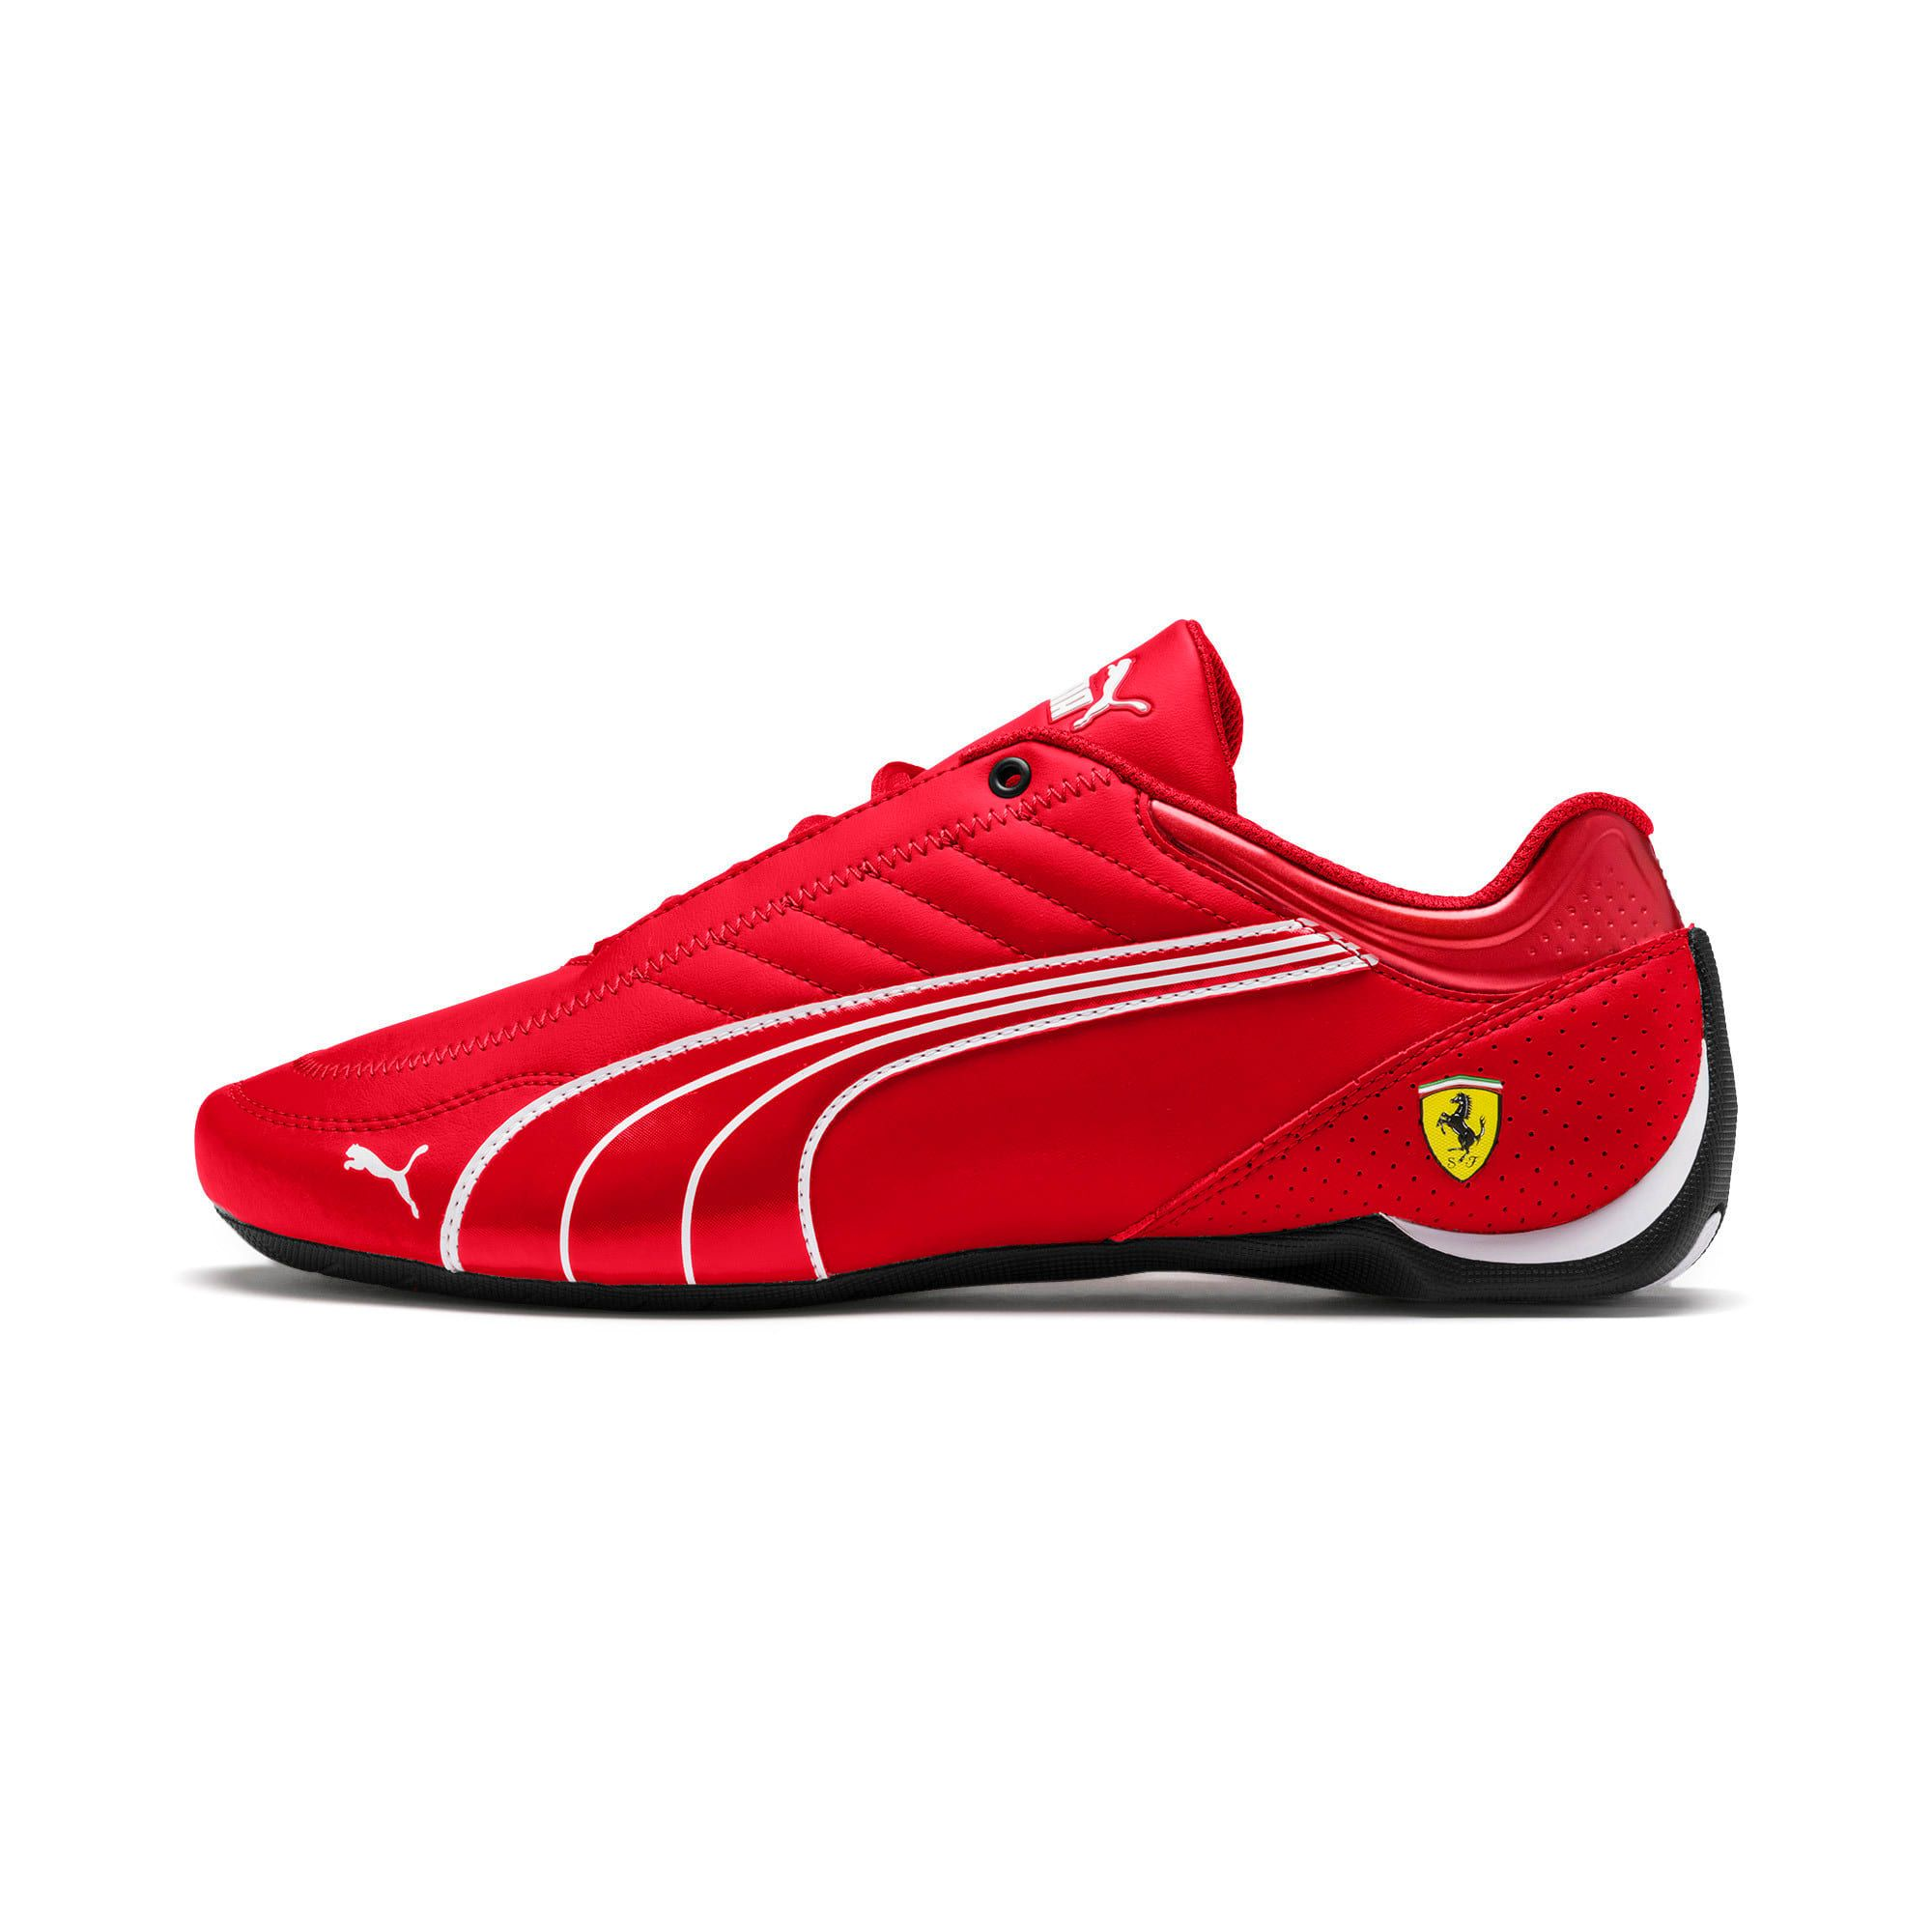 chaussures puma ferrari rouge femme